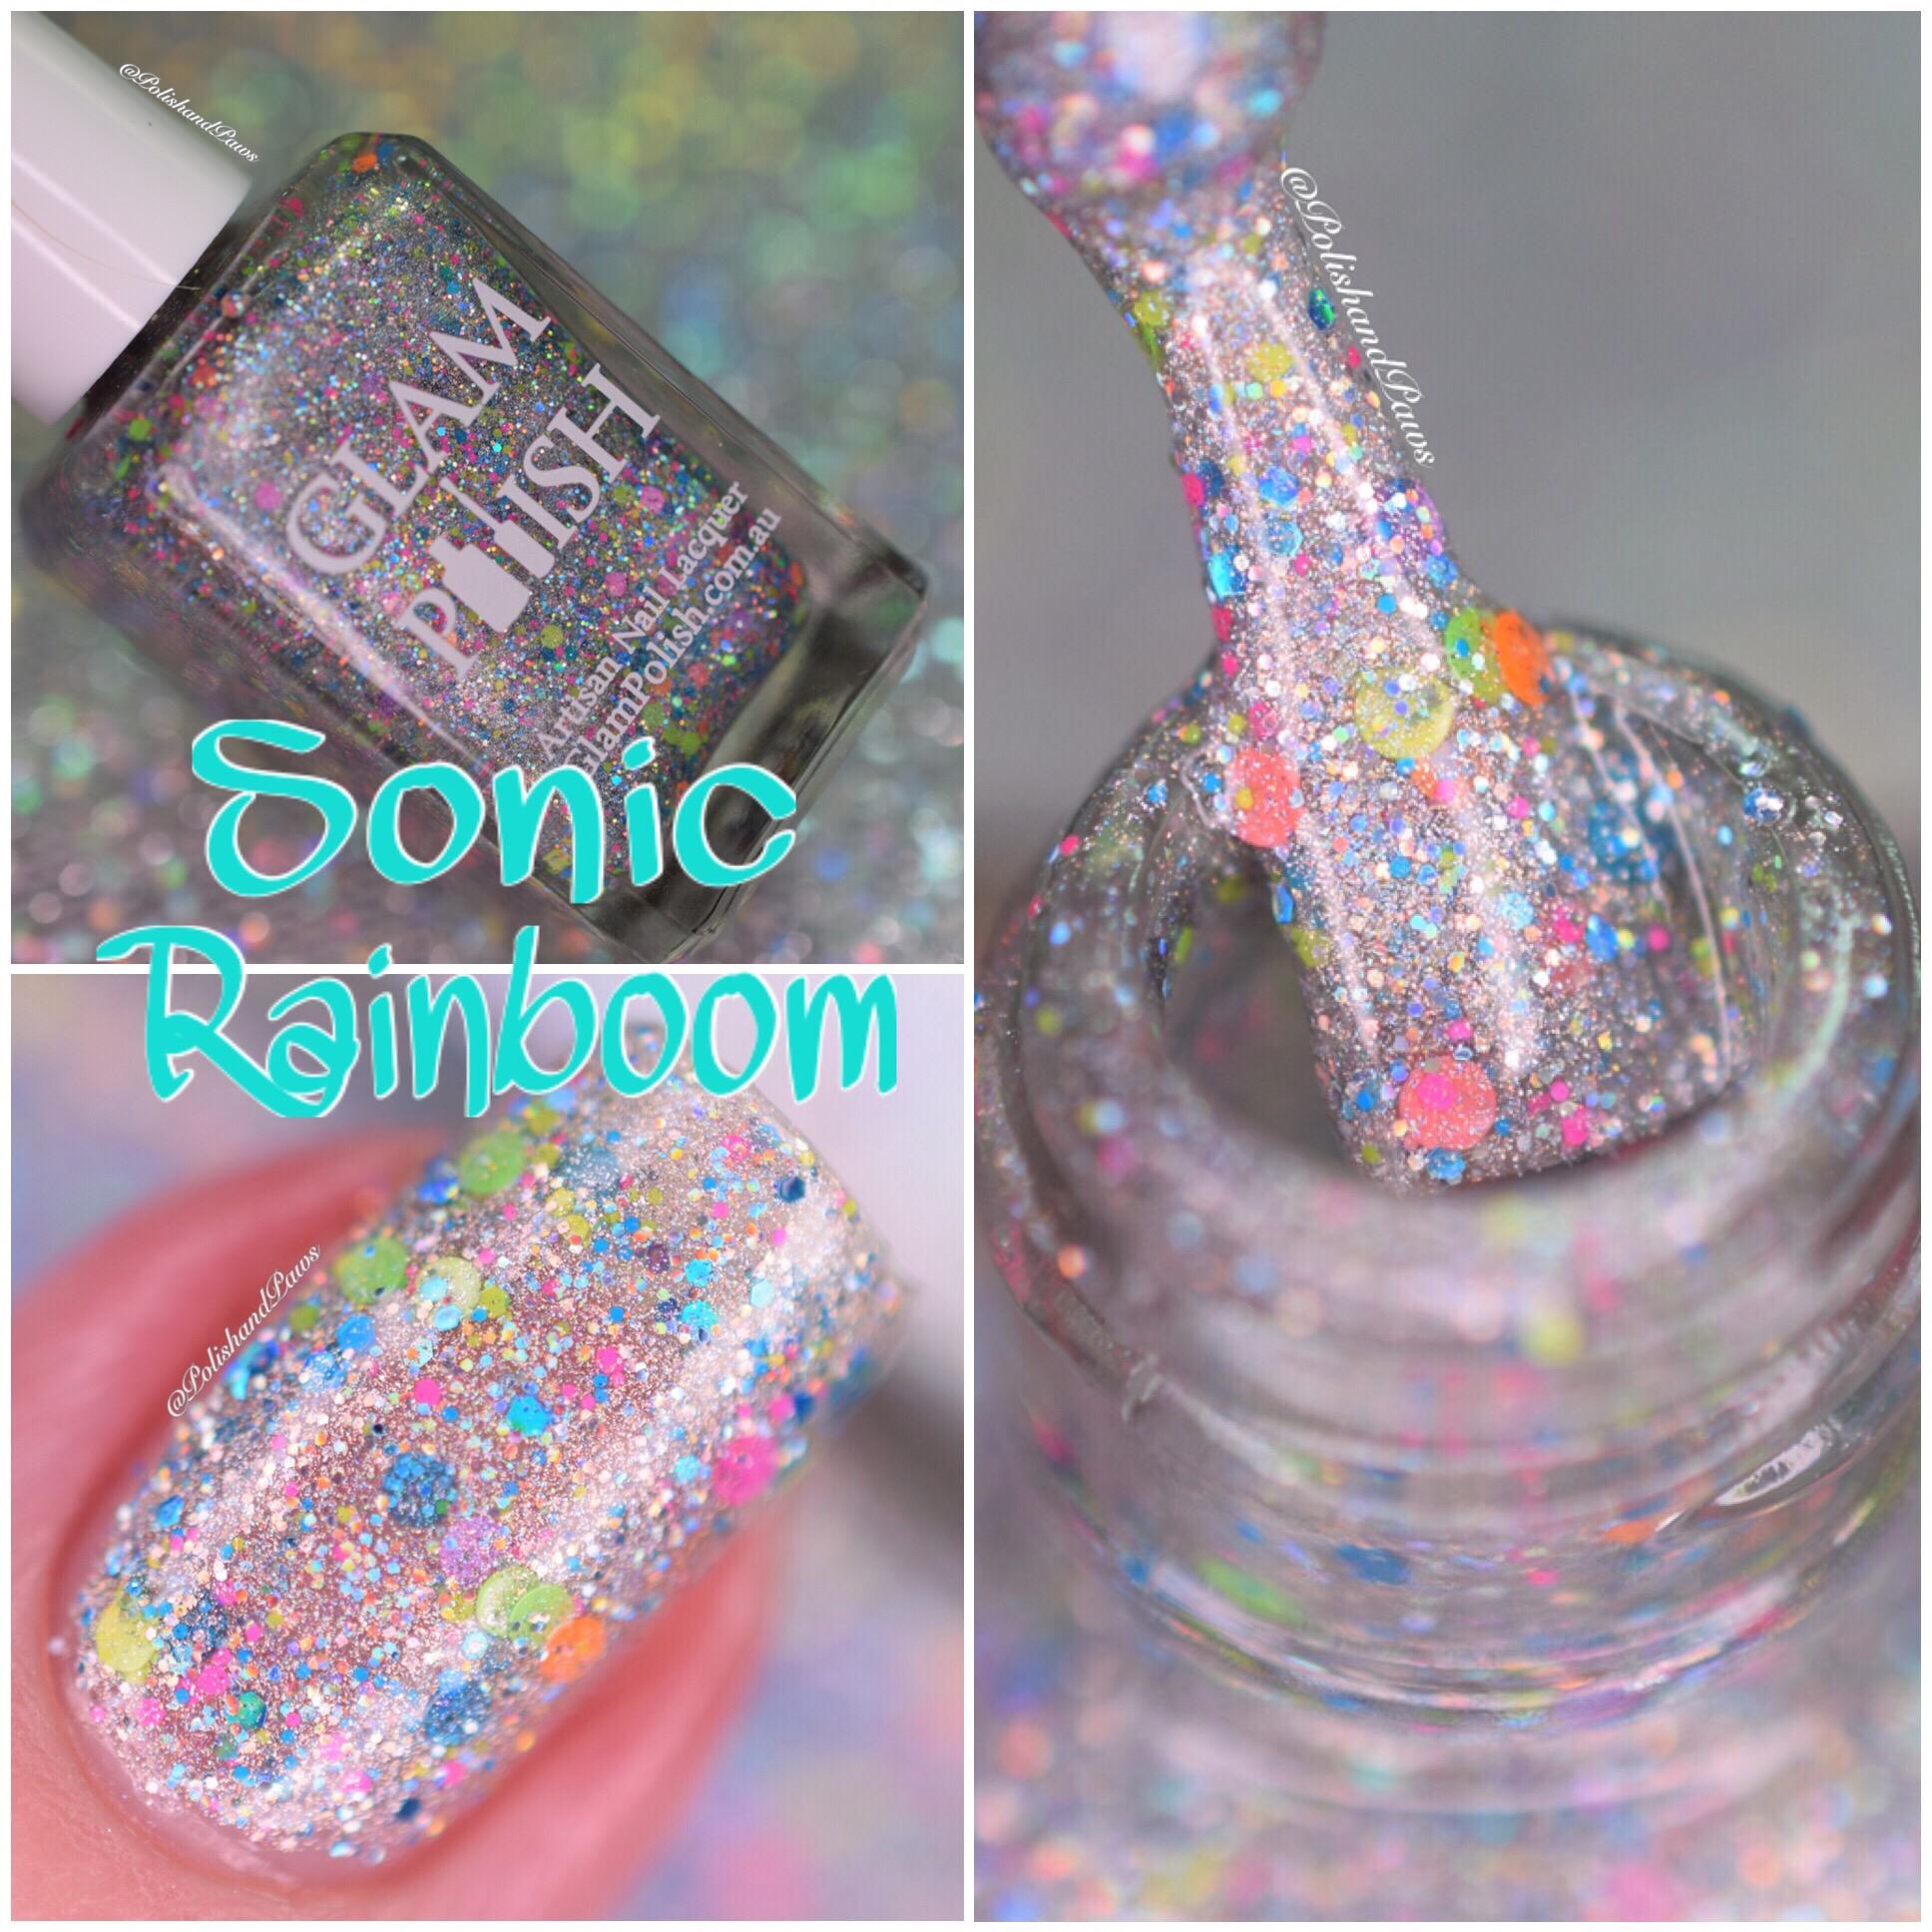 Glam Polish Sonic Rainboom collage